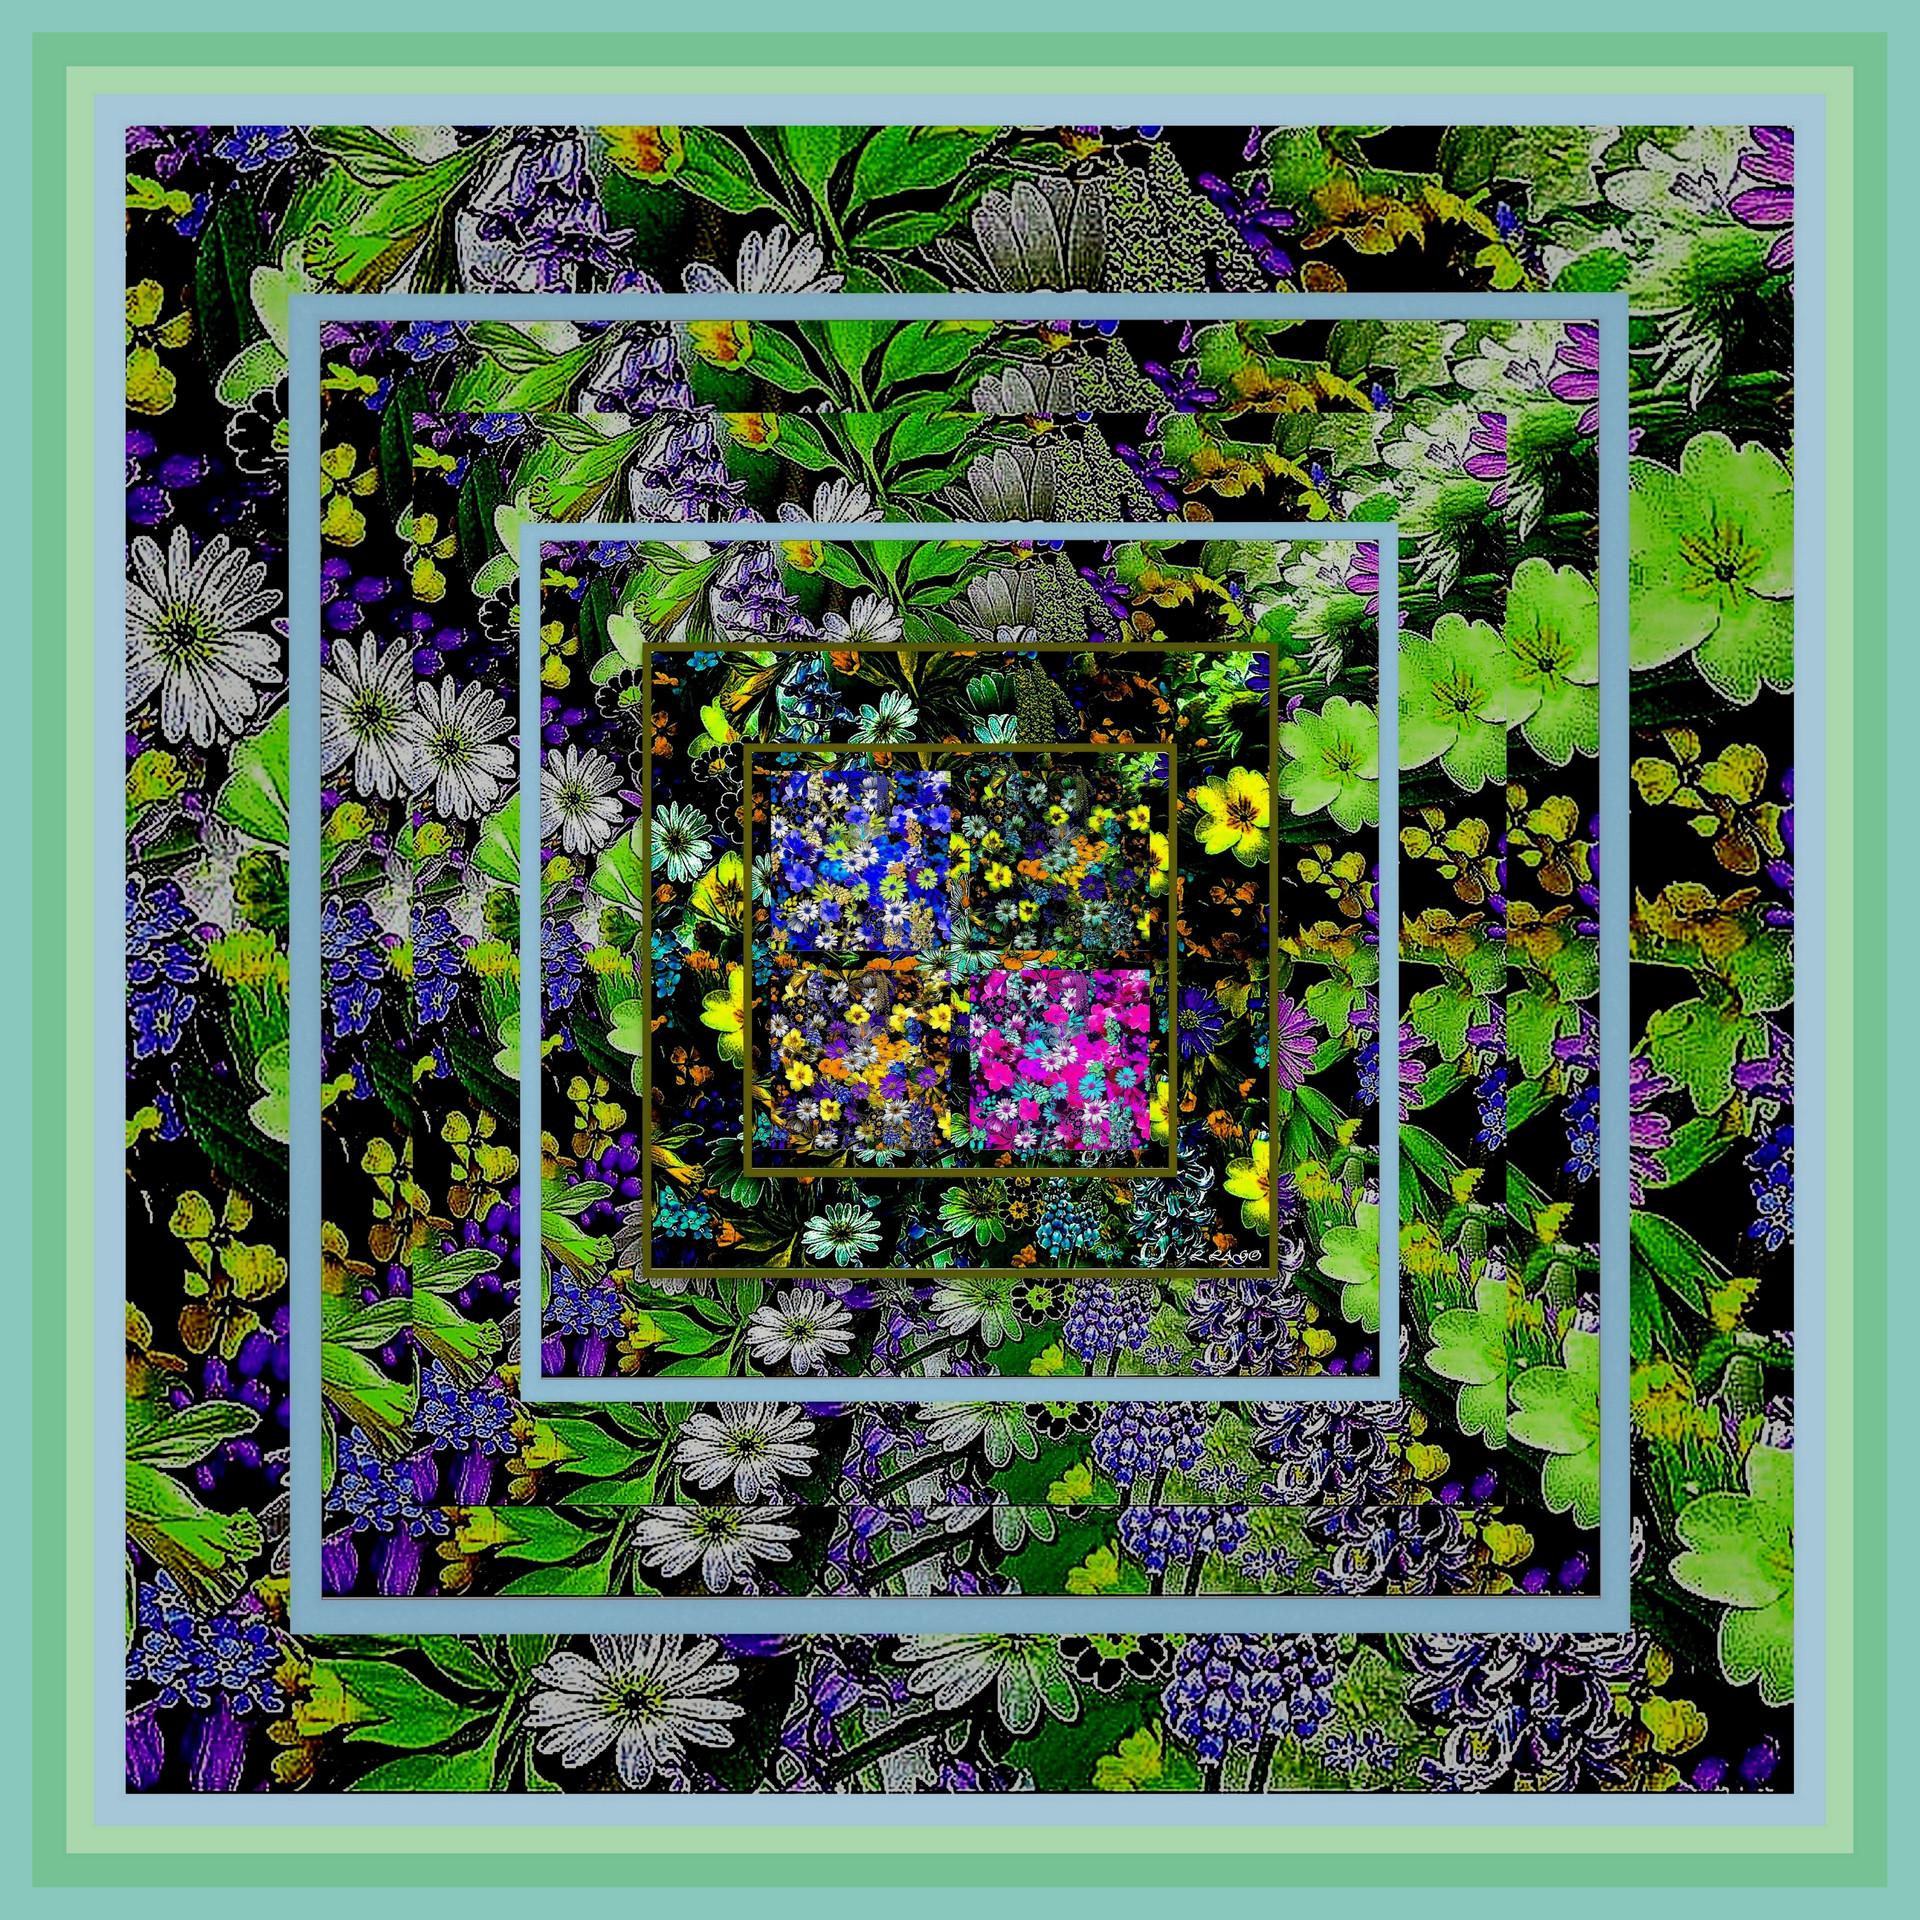 1-Collage407.jpg